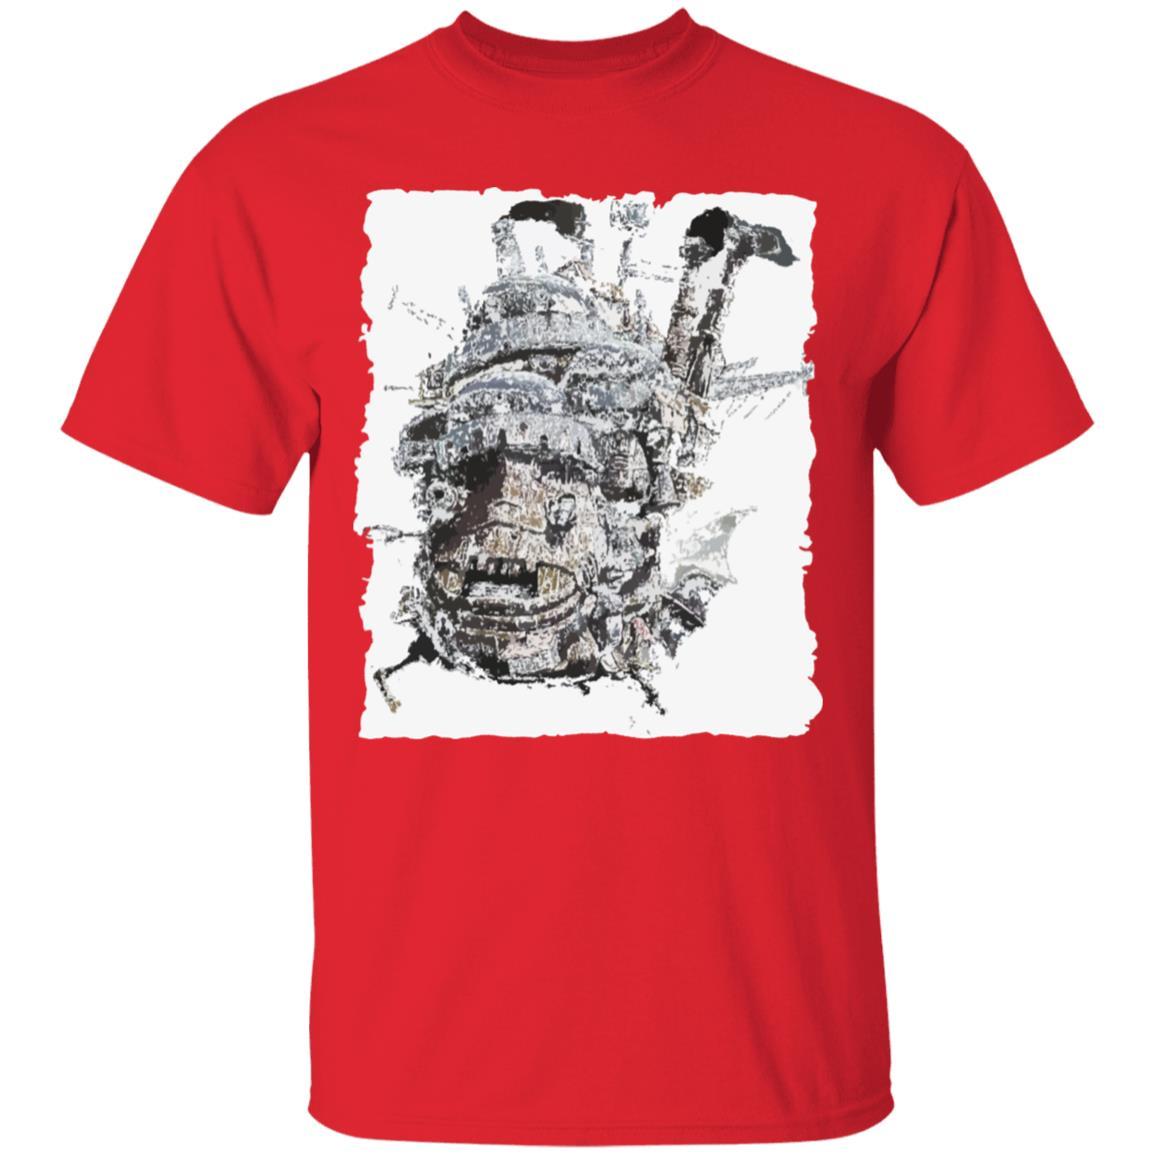 Howl's moving castle Essential T Shirt Unisex